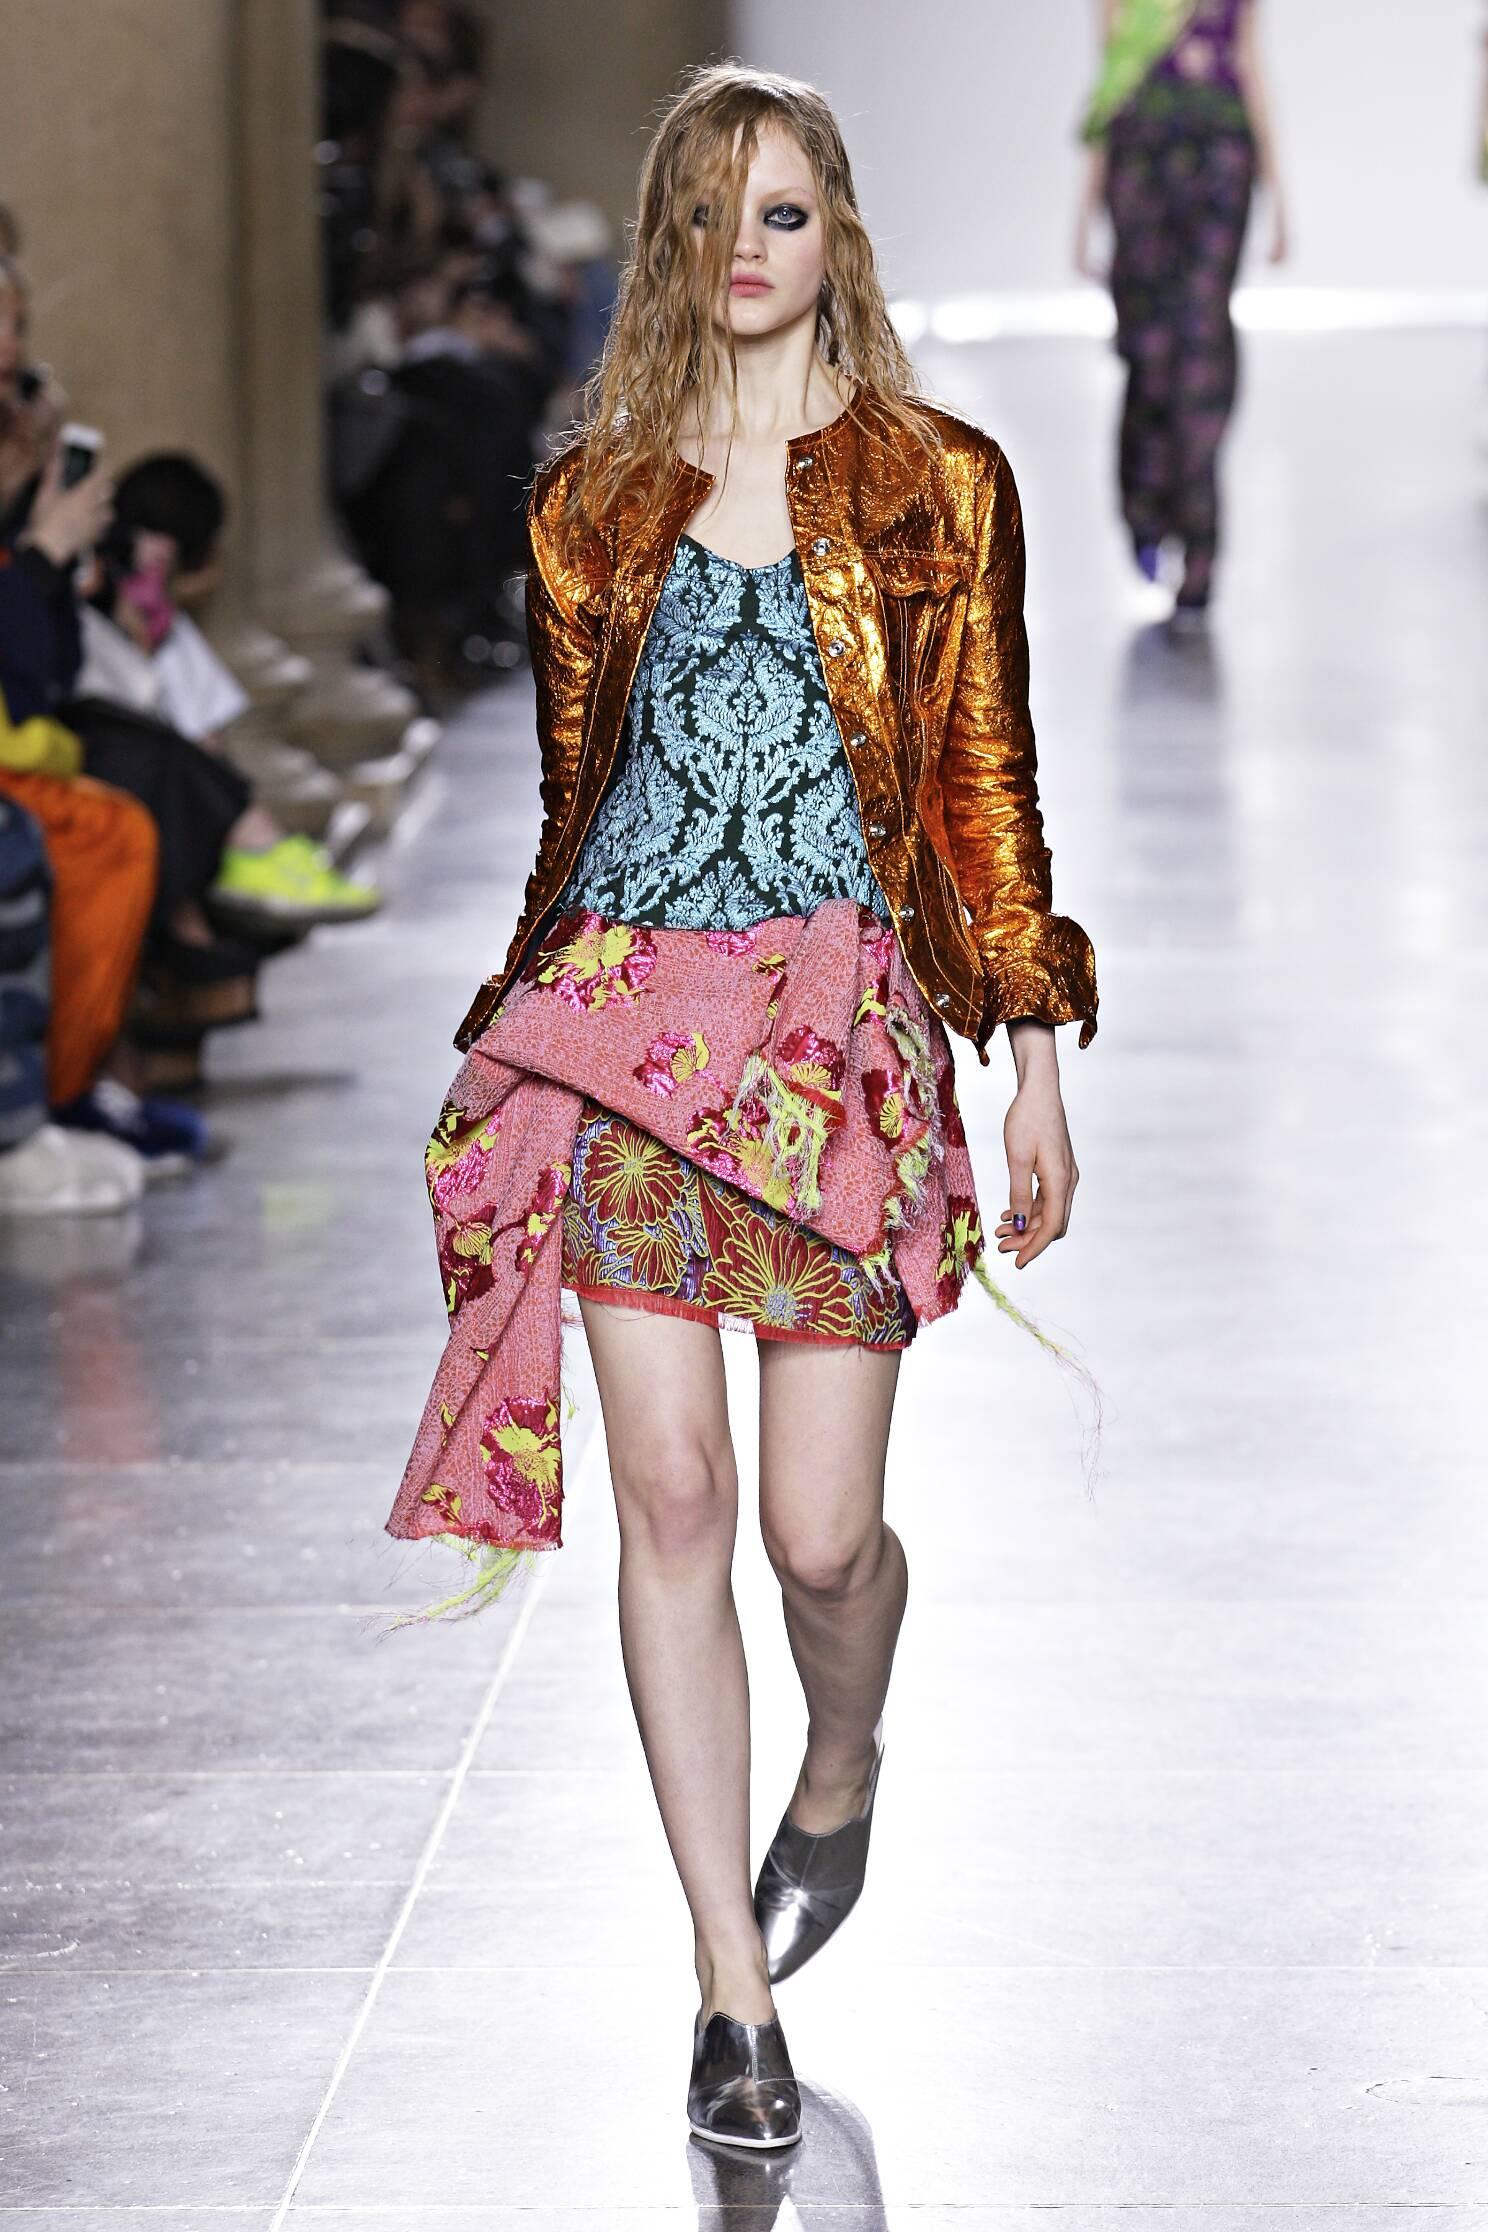 Winter Fashion Trends 2015 2016 Marques Almeida Collection